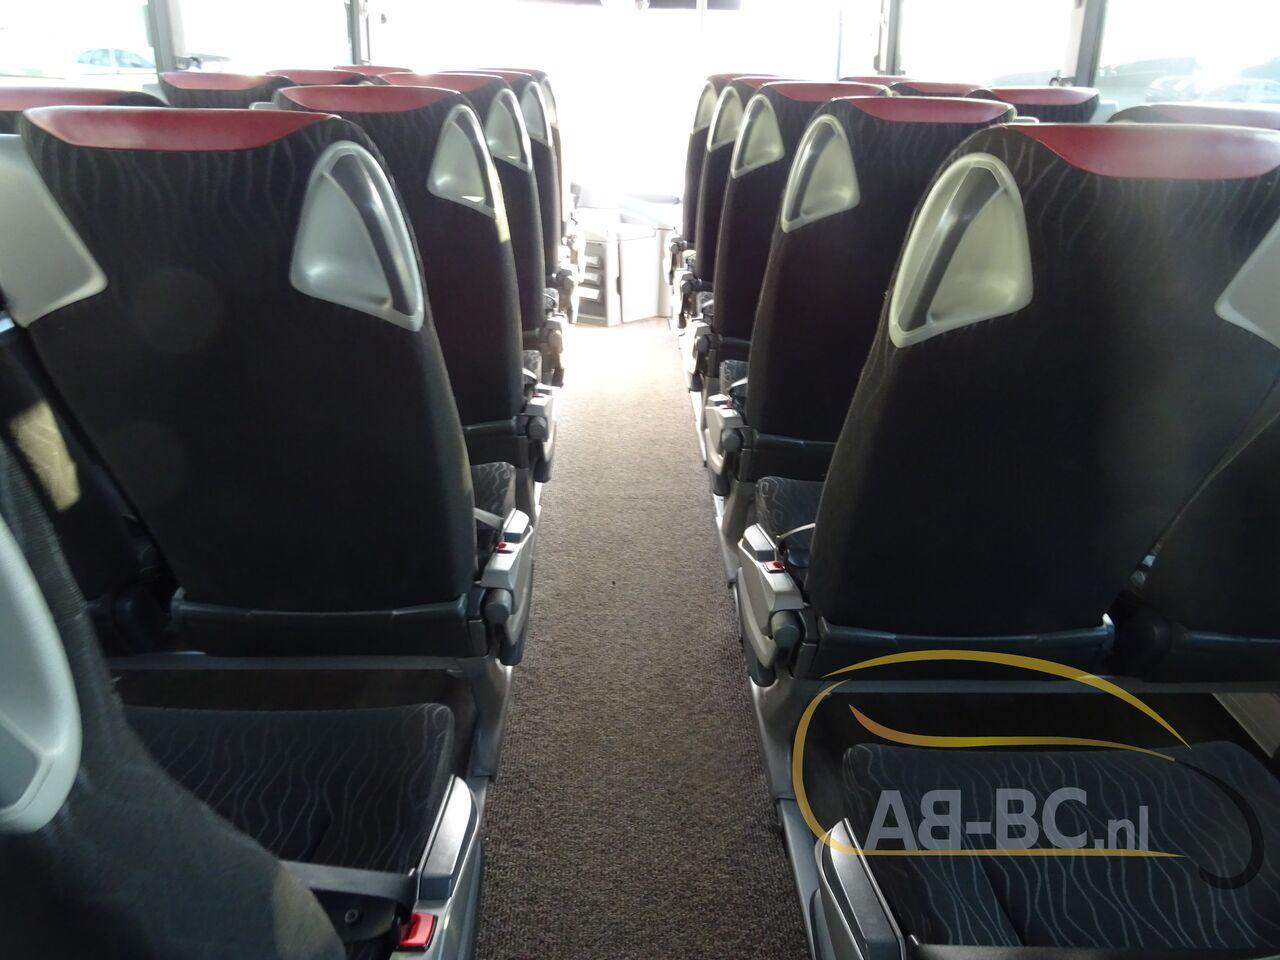 coach-bus-SETRA-S415H-52-Seats-EURO-6-Liftbus---1630913543760344540_big_9dd2b606ceb64430fc4922483774db34--21070517141280735500